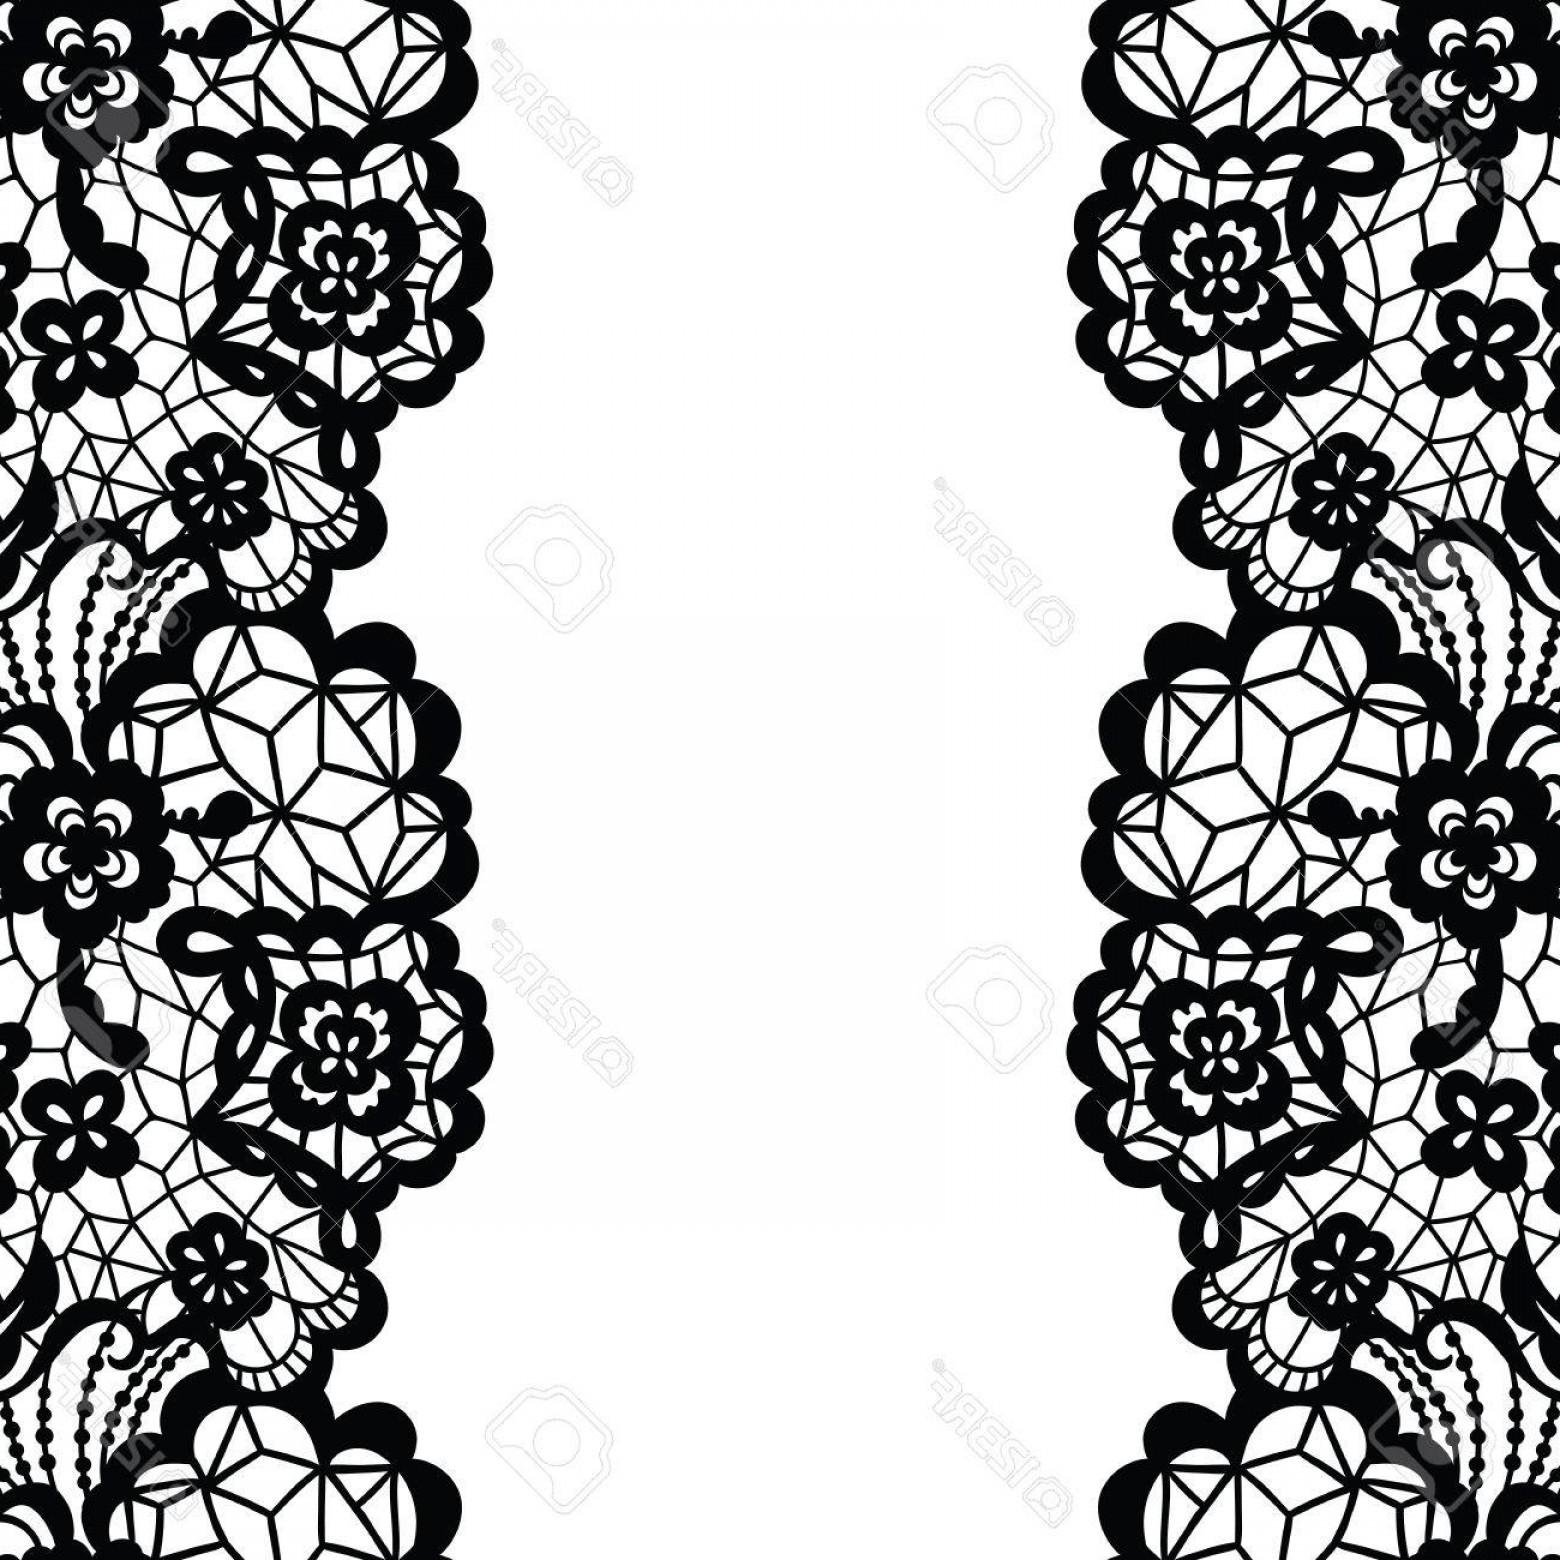 1560x1560 Photostock Vector Seamless Lace Border Vector Illustration Black